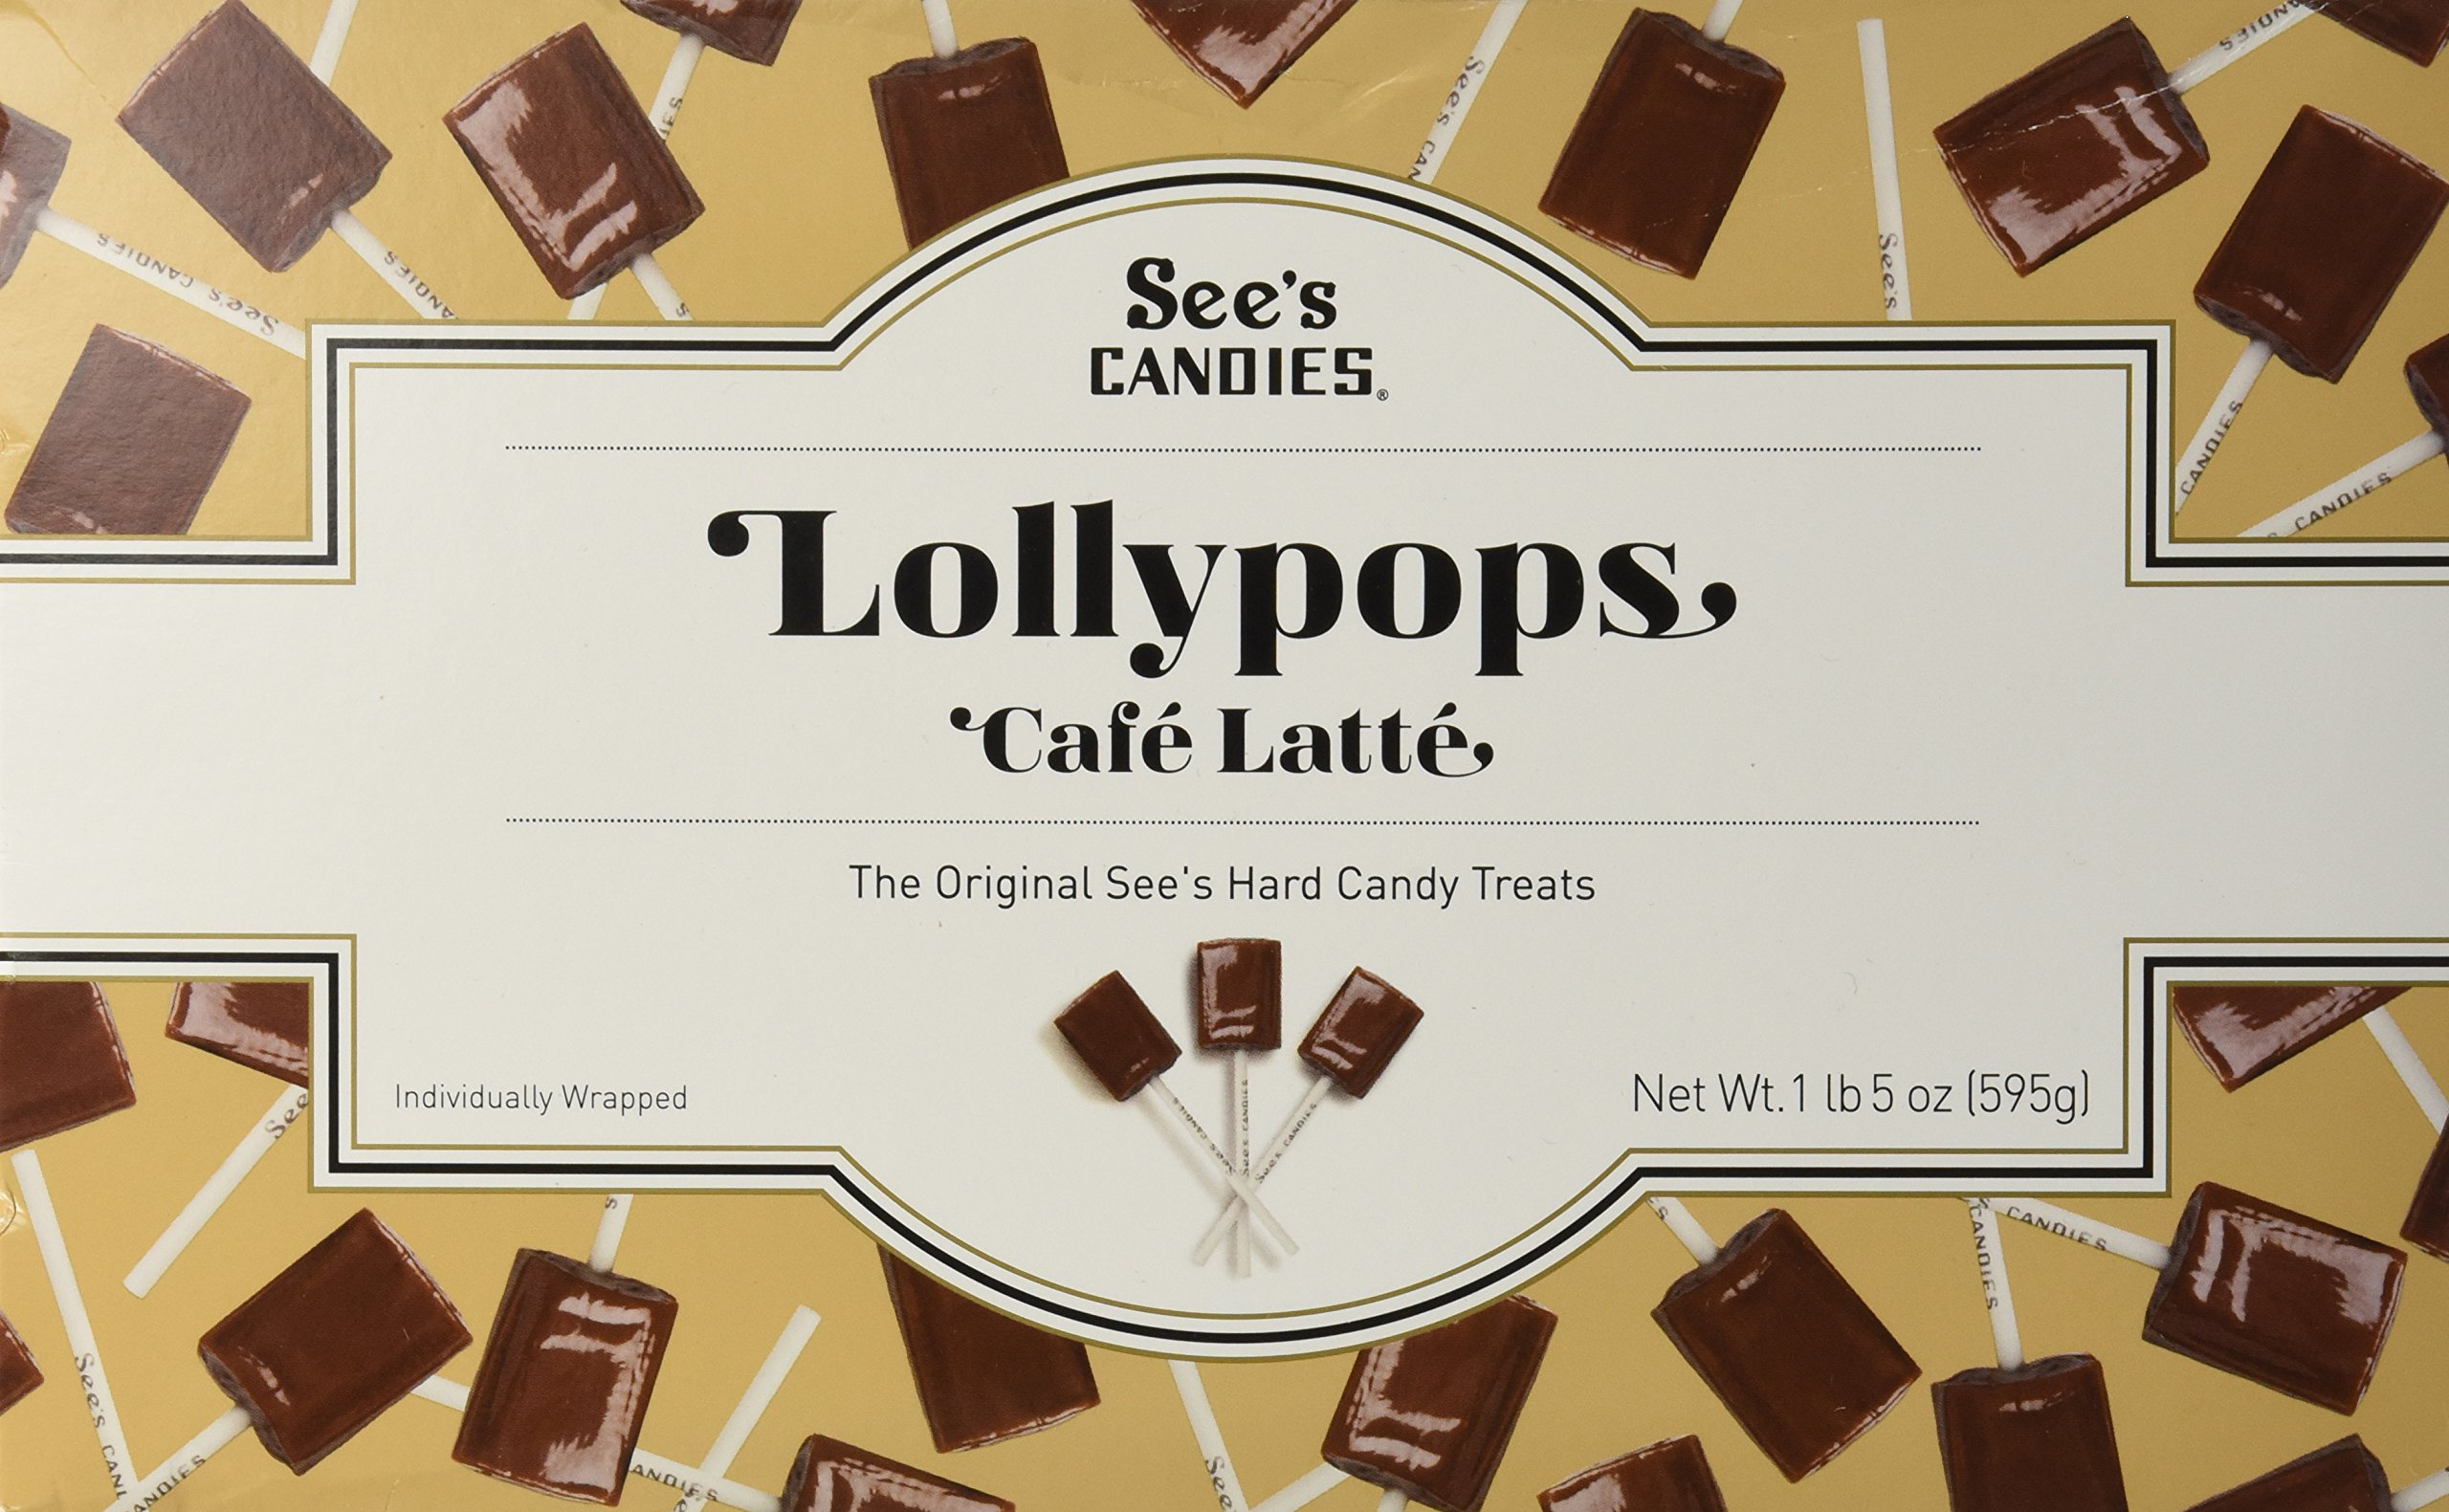 See's Candies 1 lb. 5 oz. Cafe Latte Lollypops